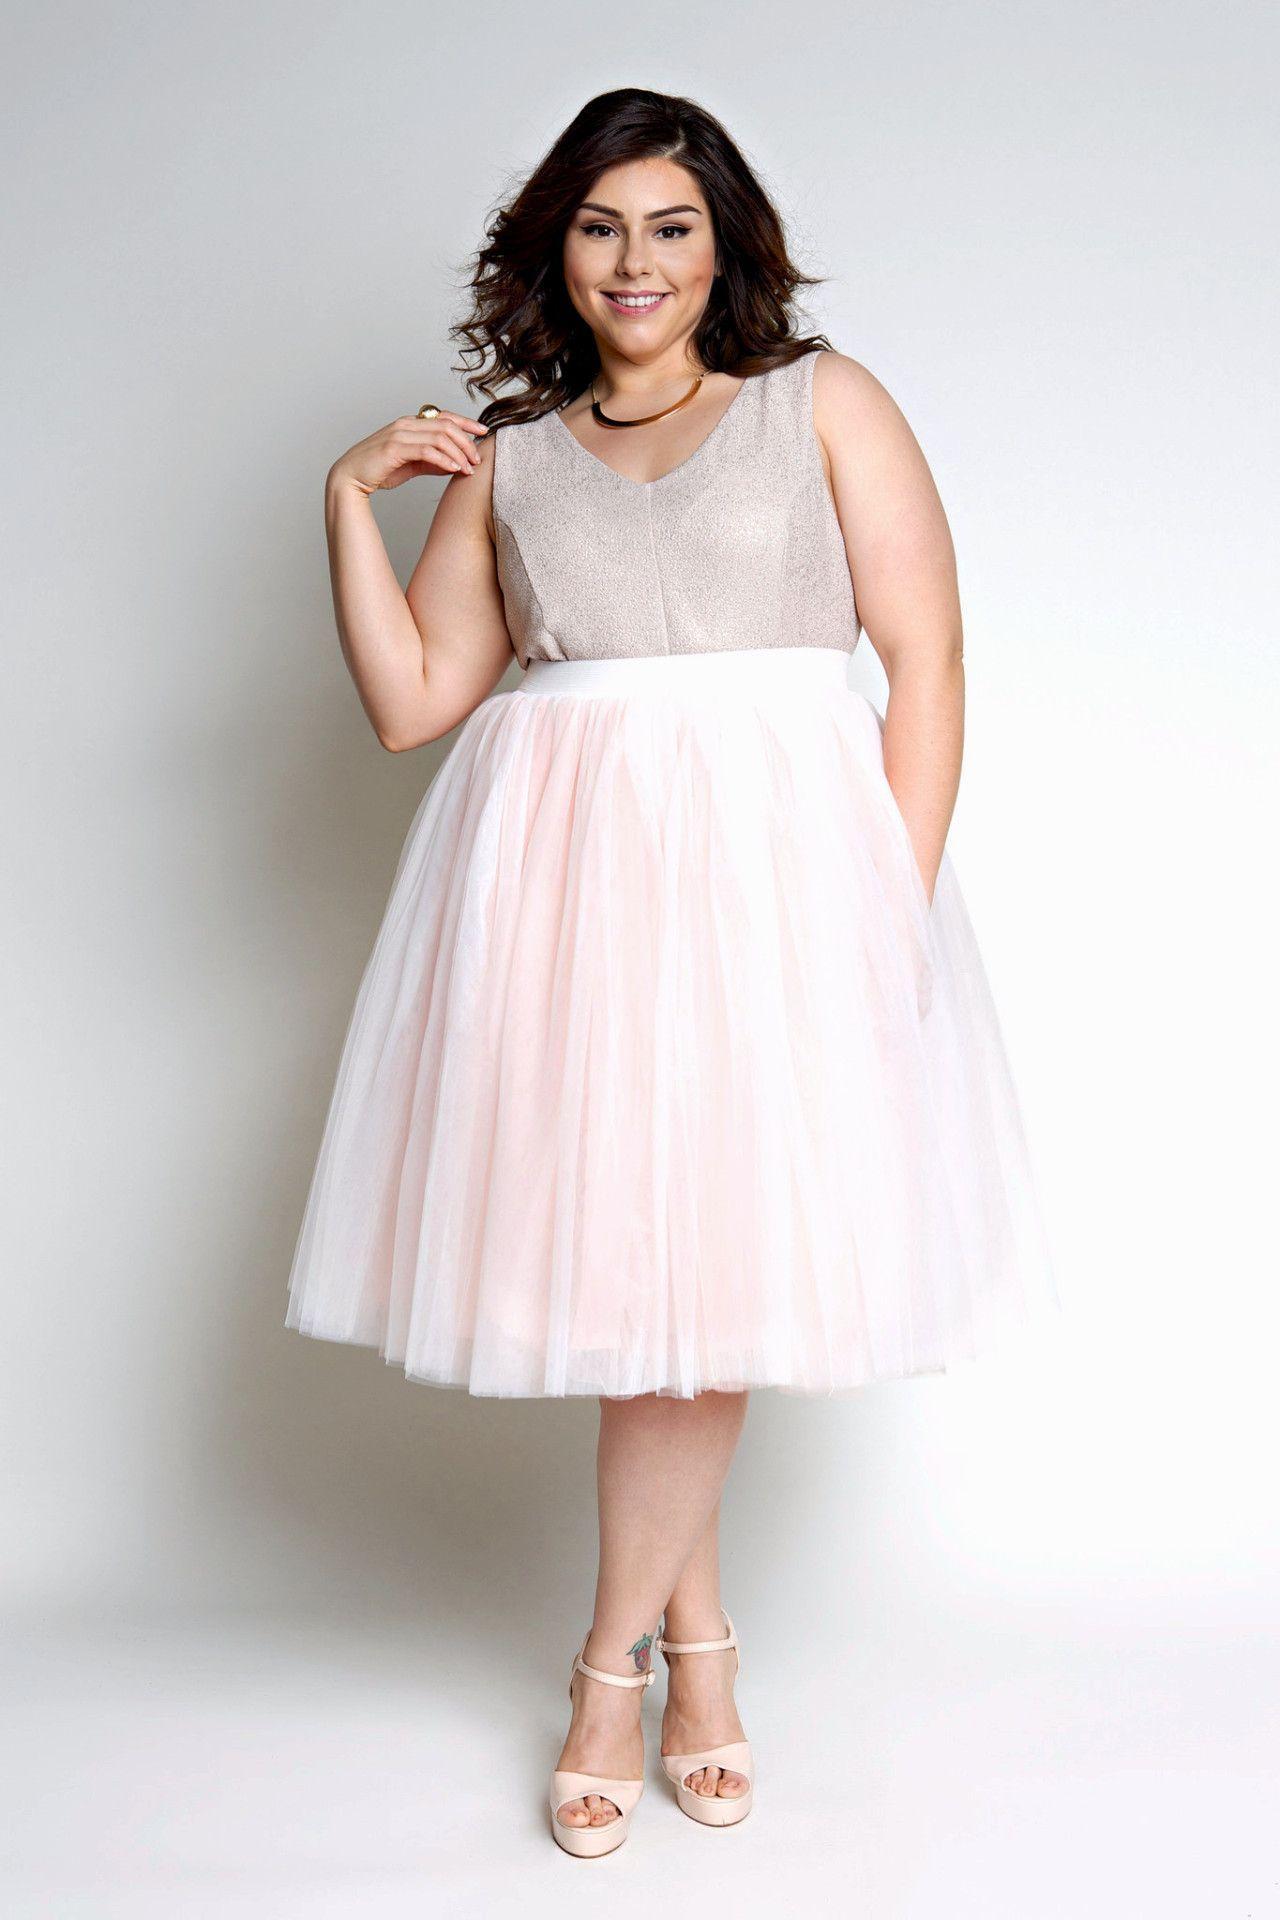 fecdd362 Plus Size Clothing for Women - Society+ Premium Tutu - Blush - Society+ - Society  Plus - Buy Online Now! - 3